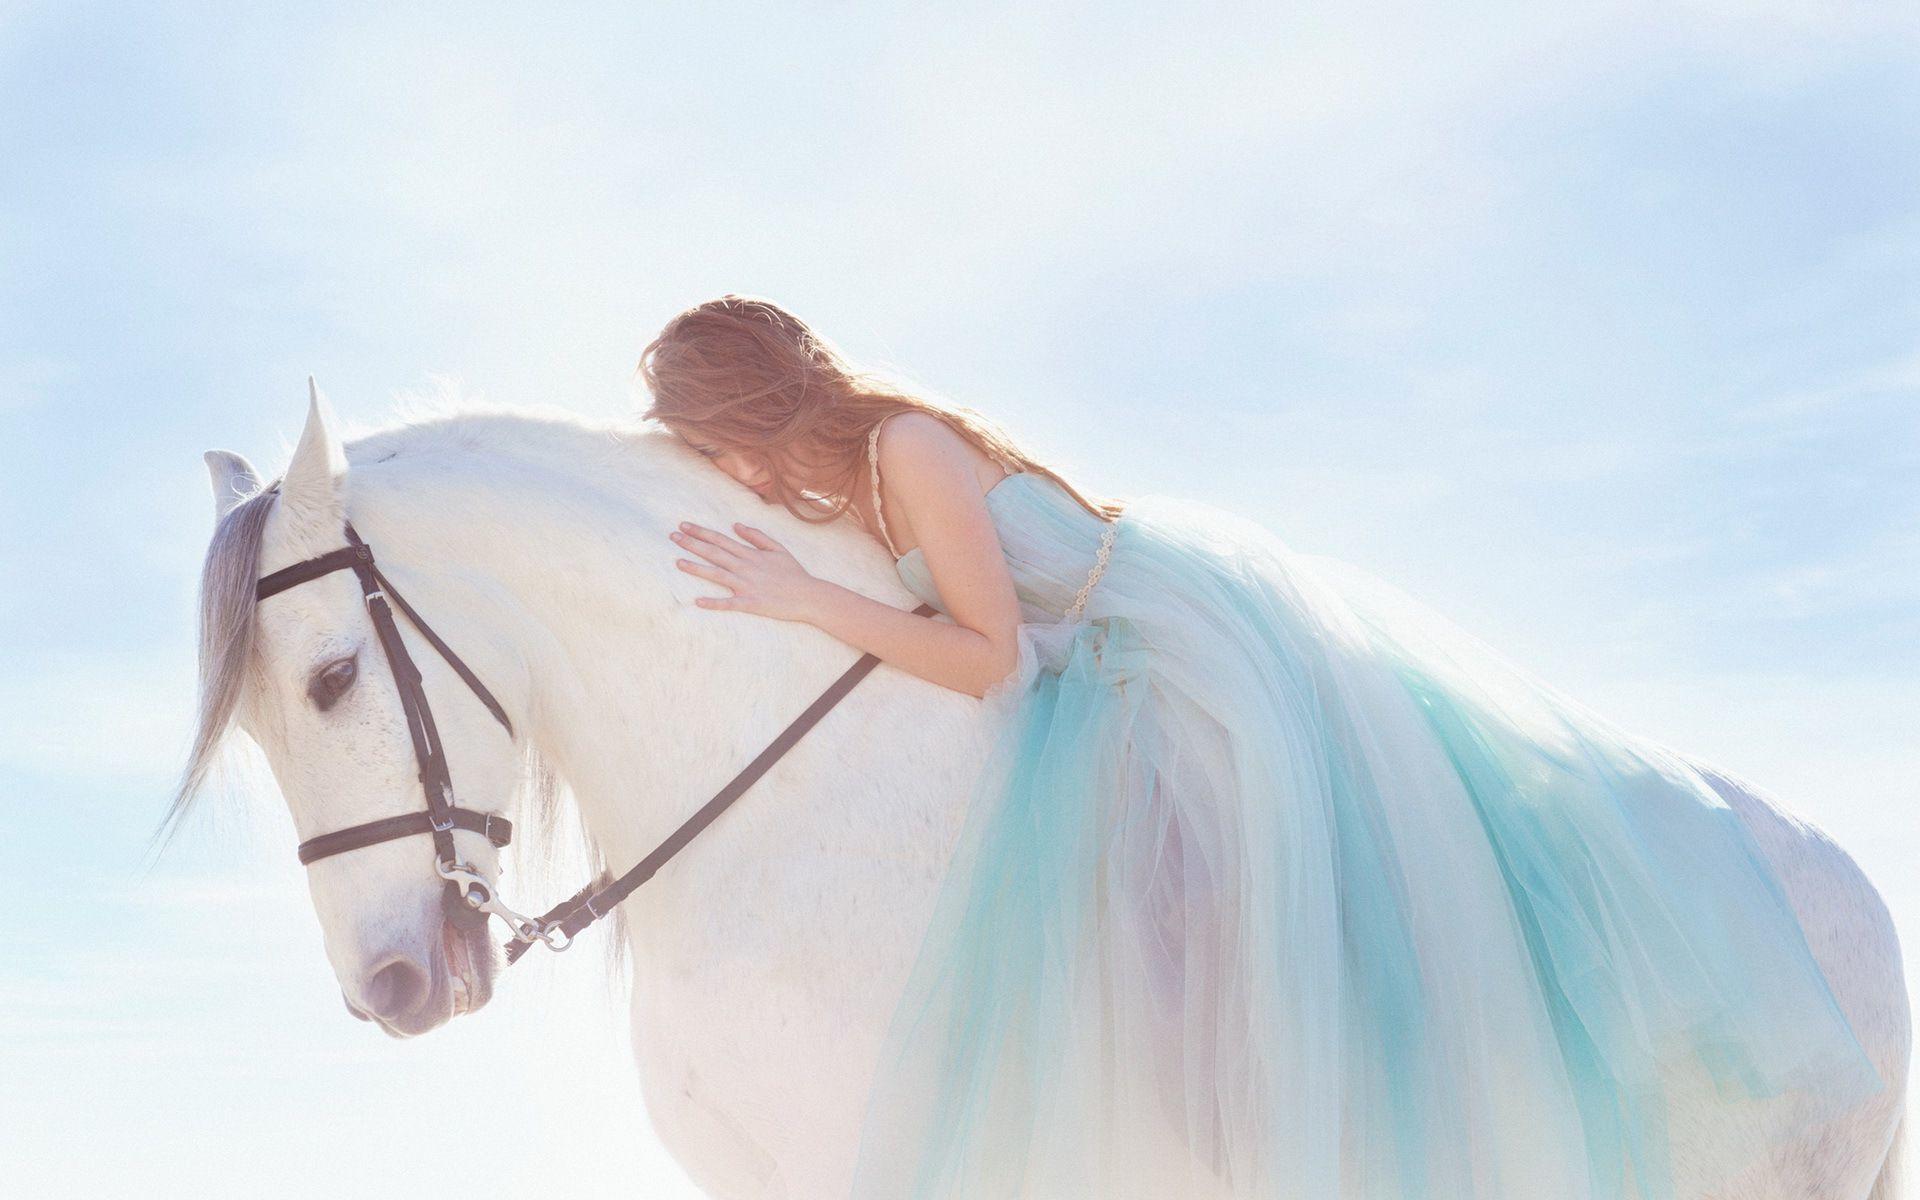 White Horse Wallpapers Full Hd Horse Wallpaper White Horse Photography White Horse